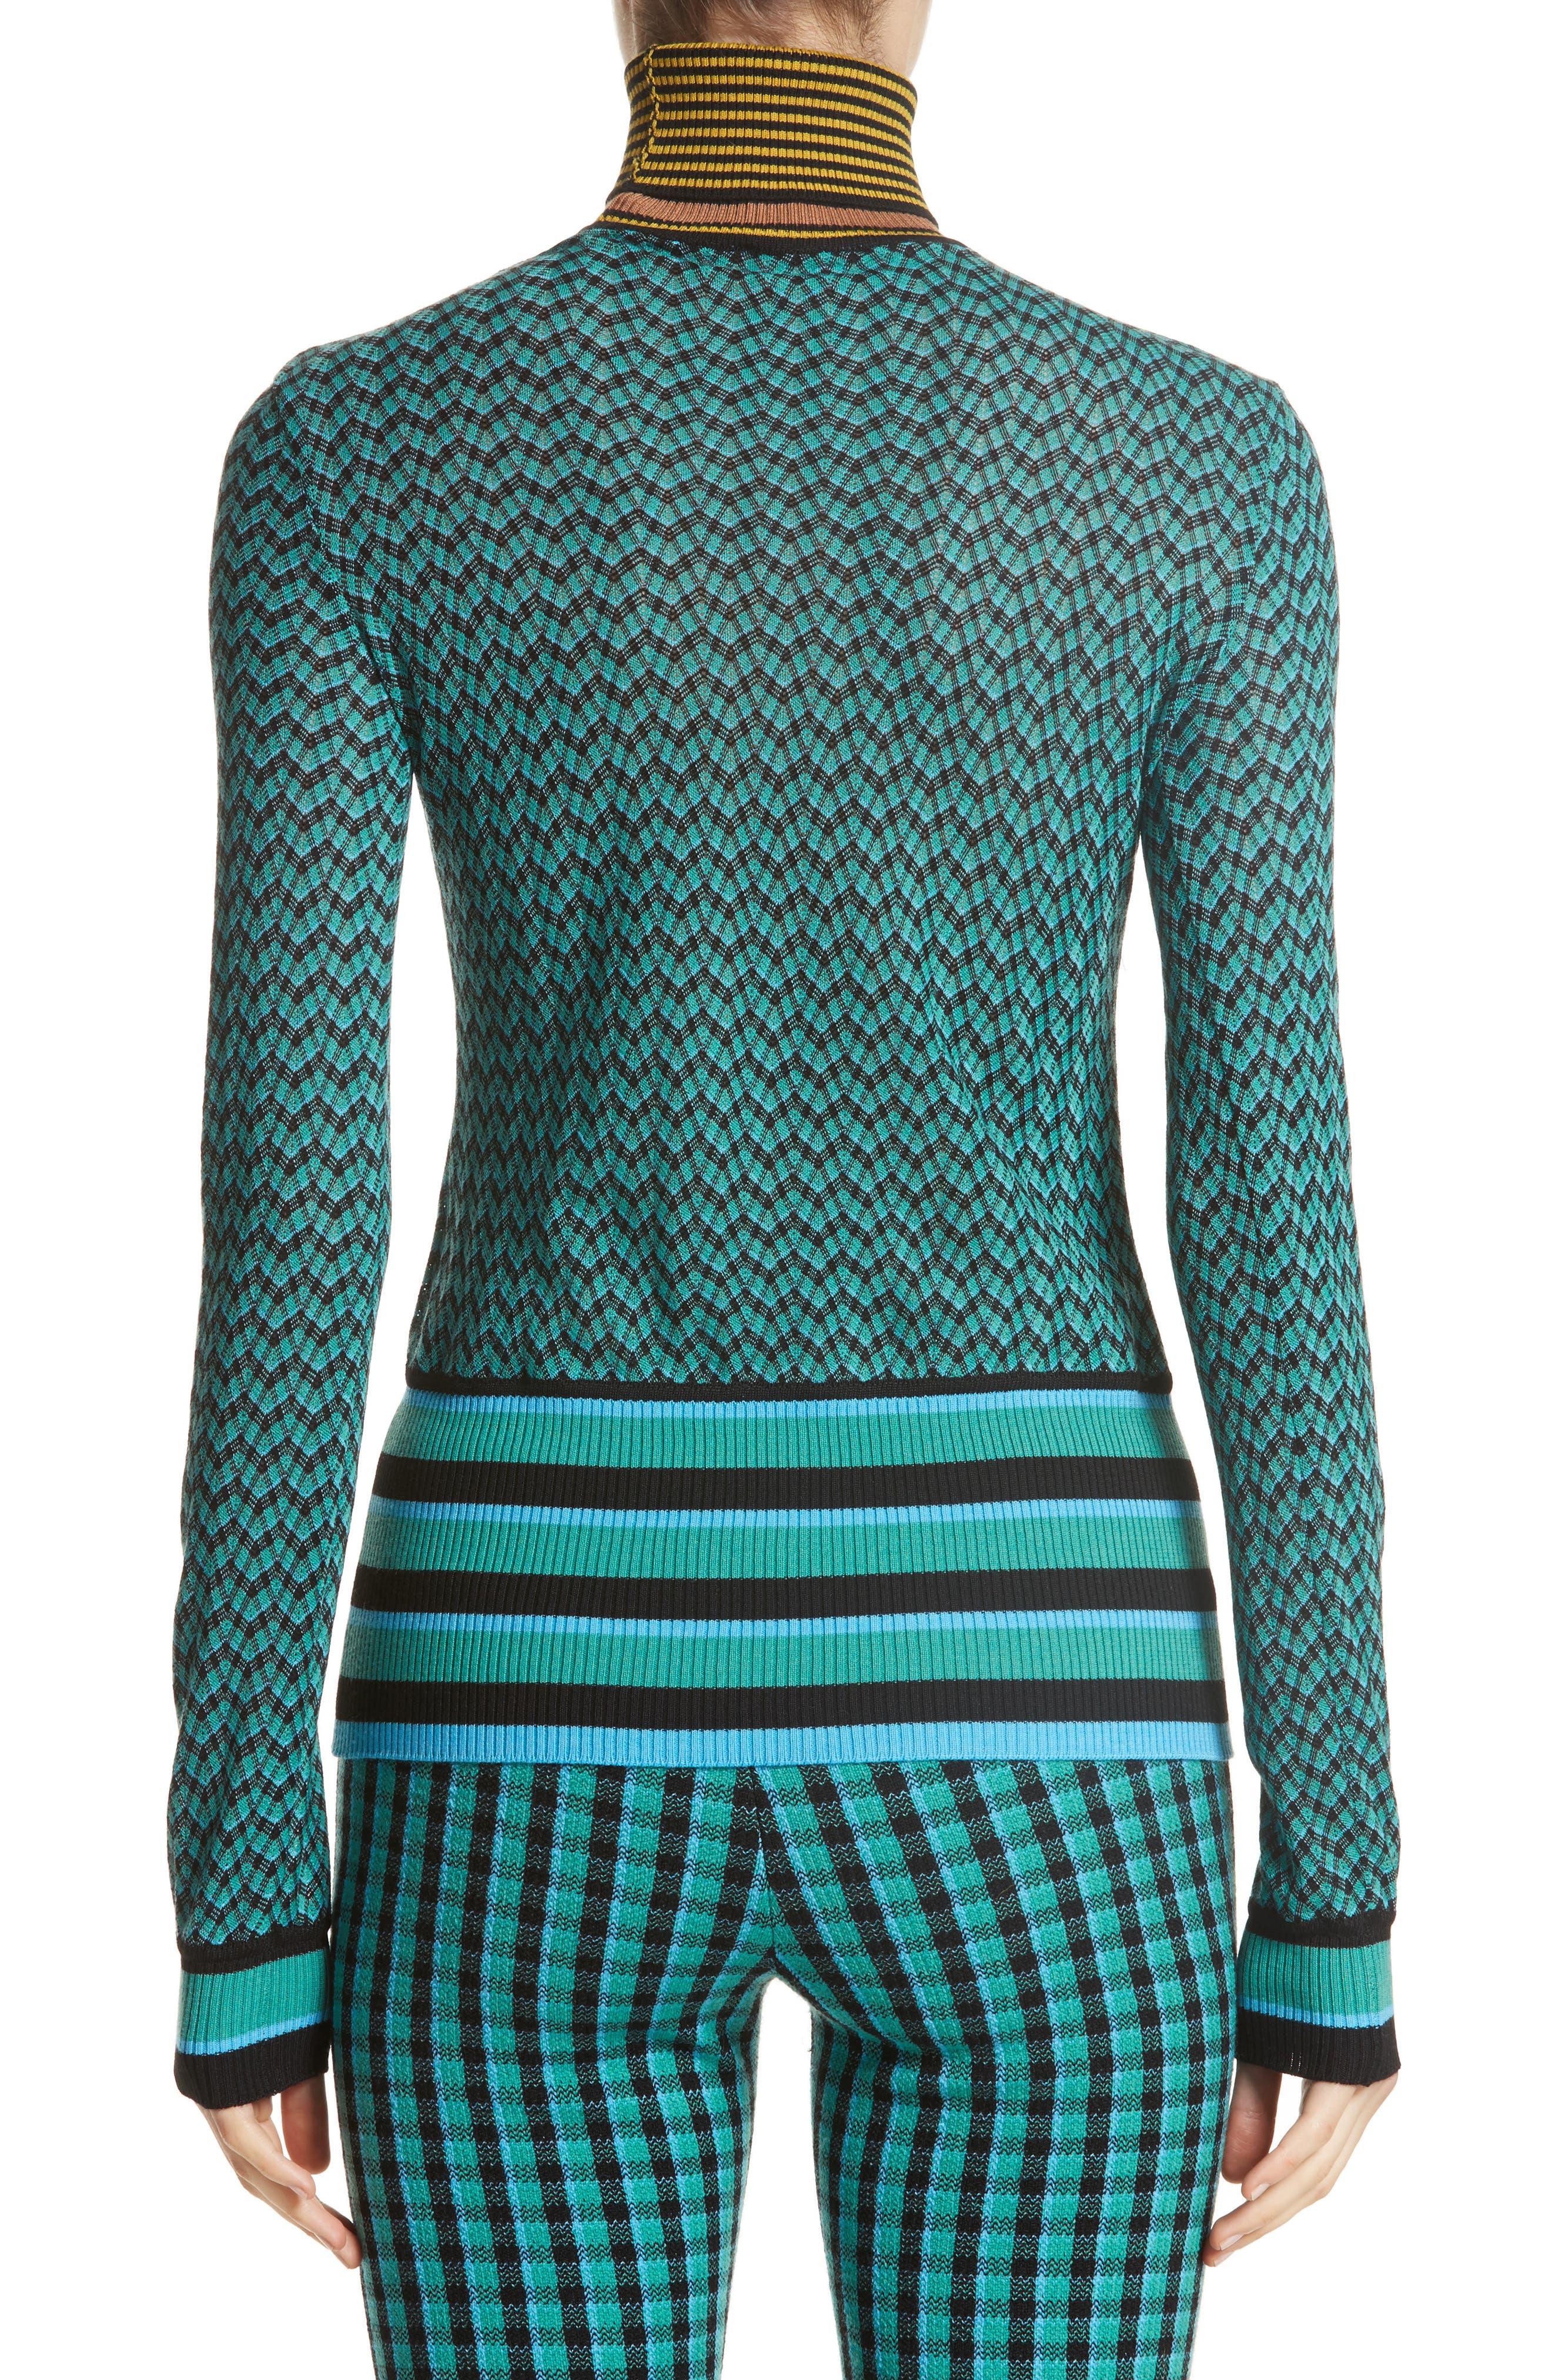 Zigzag & Stripe Mock Neck Sweater,                             Alternate thumbnail 2, color,                             Green/ Blue